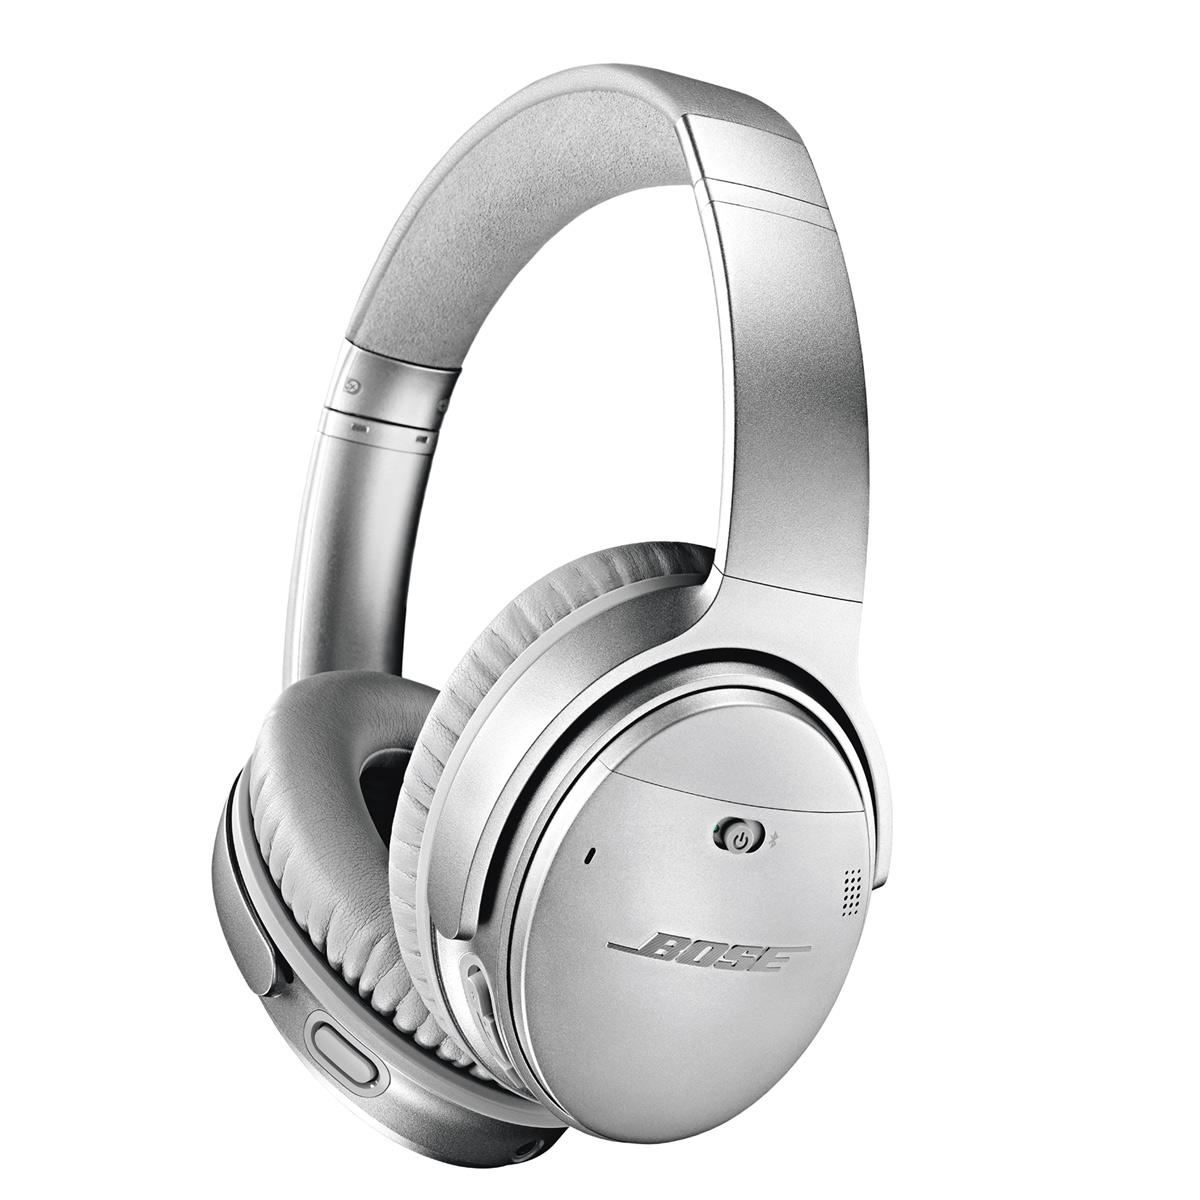 Bose QuietComfort 35 Wireless Noise-Cancelling Headphones II (Silver)